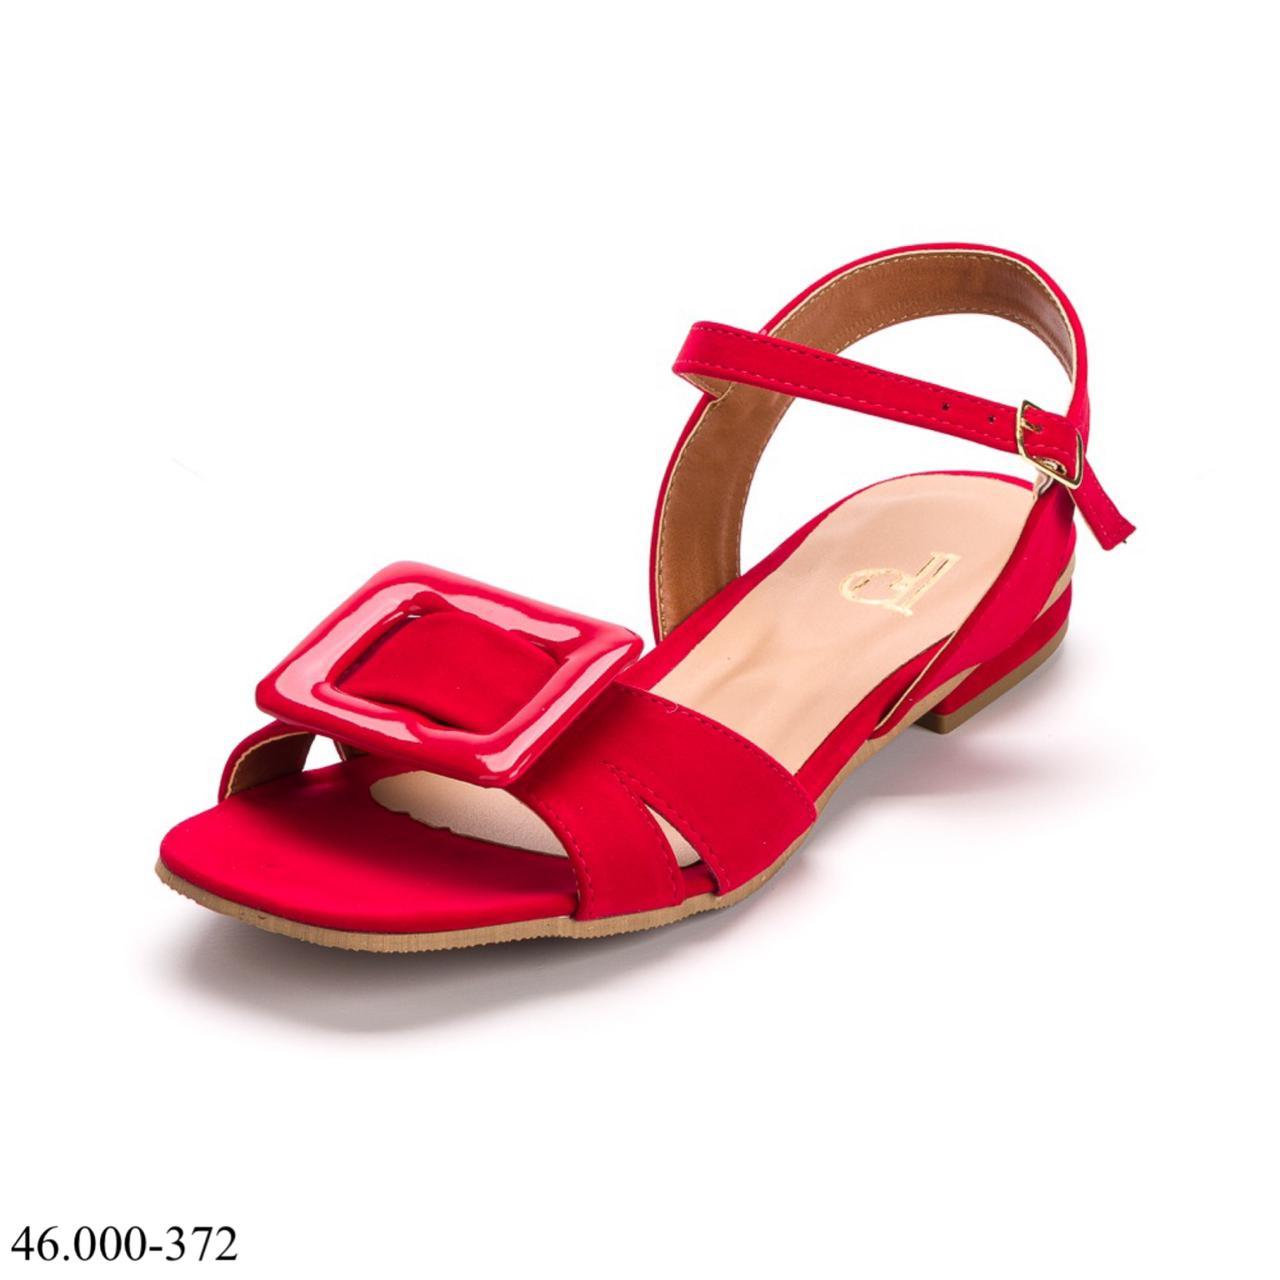 Sandália Vermelha Saltinho | D-46.000-372